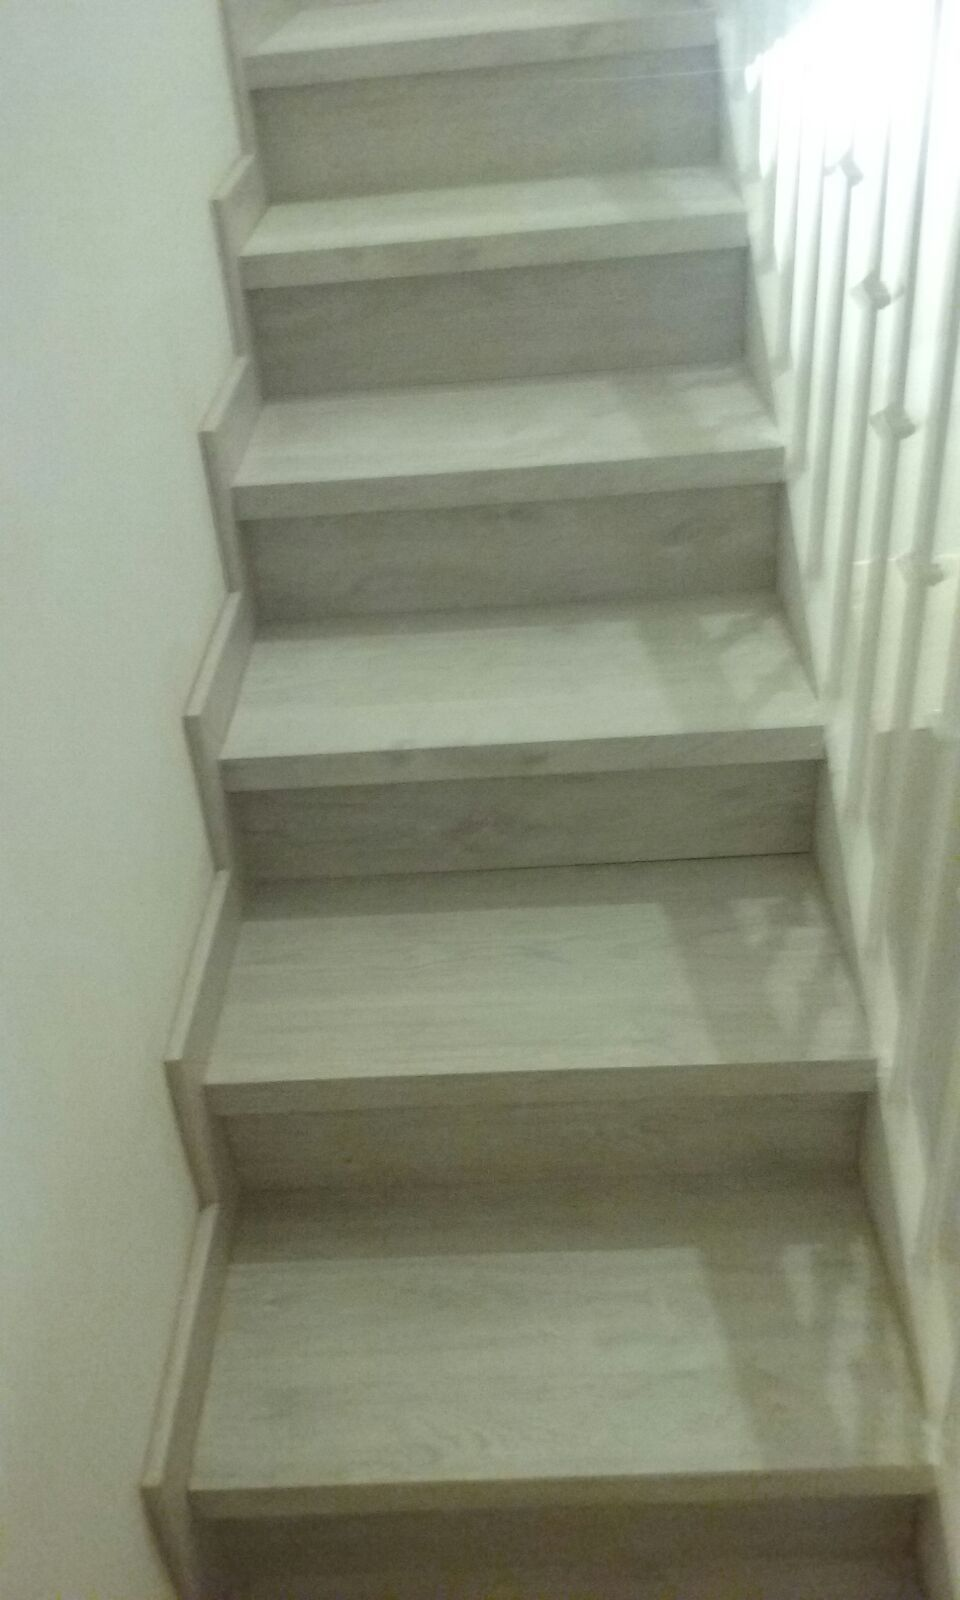 Escalera forrada con parquet